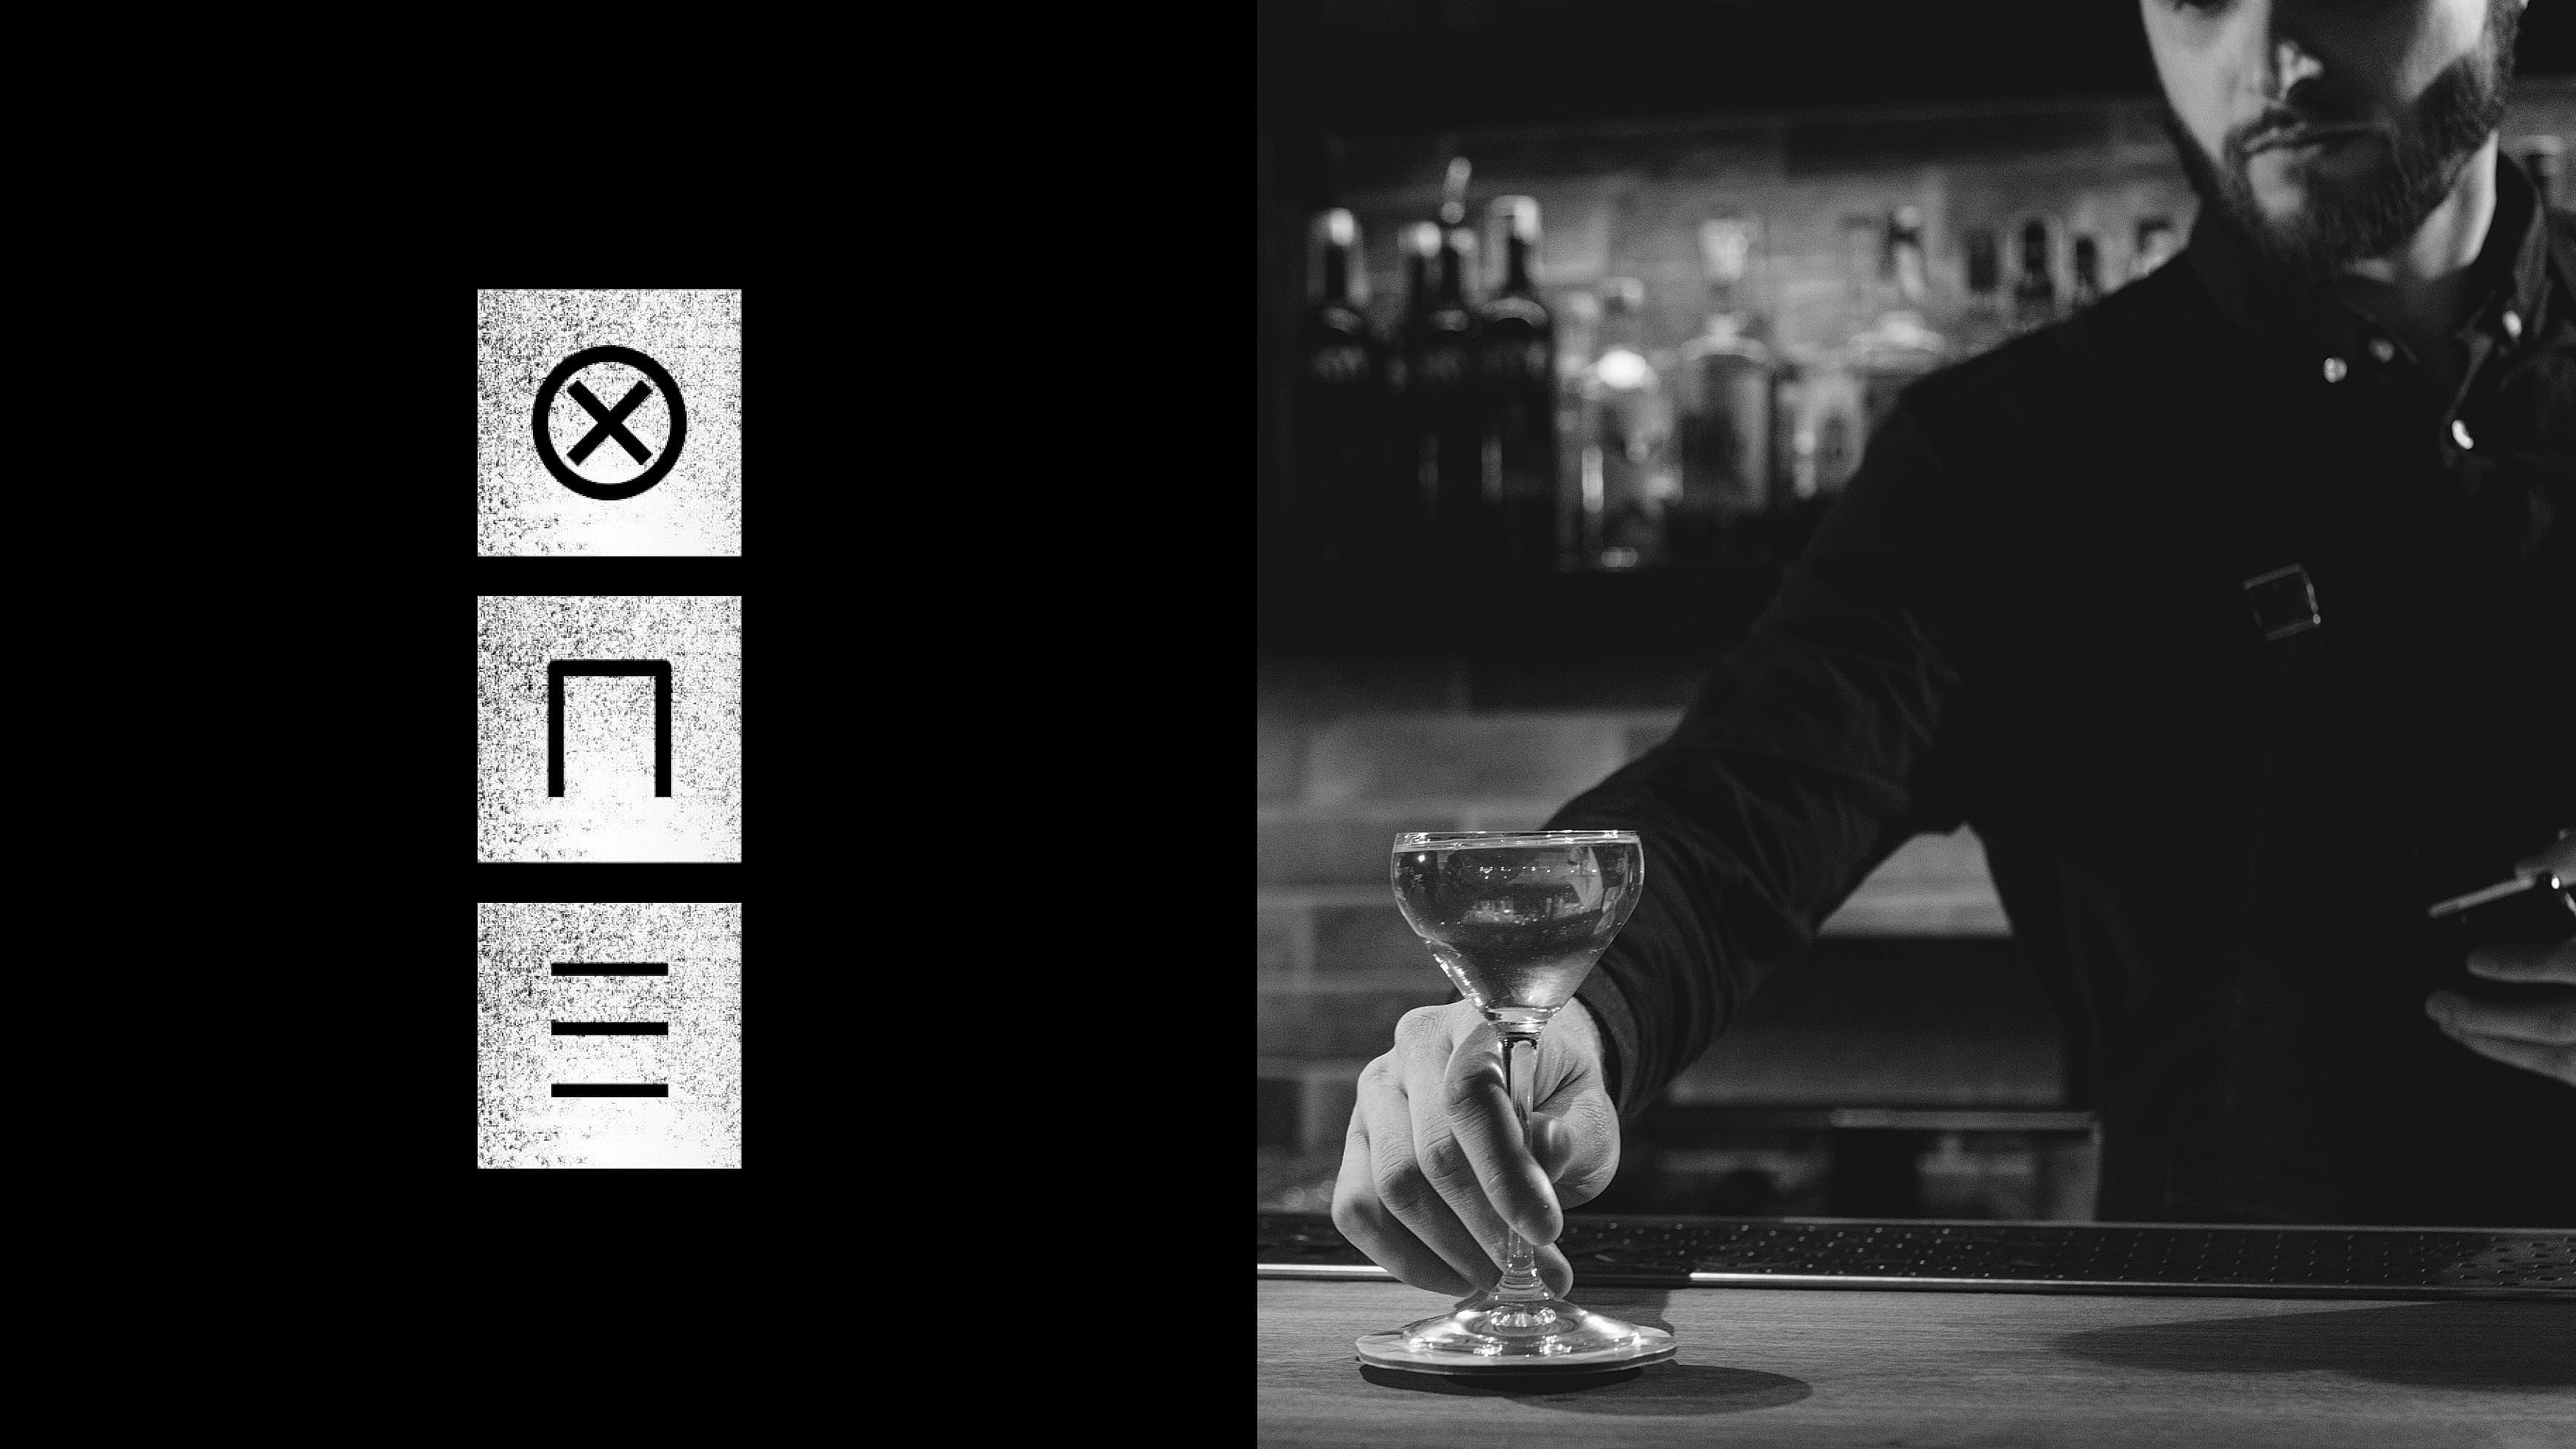 Bartender placing a drink on the counter besides a logo design for Platform One.